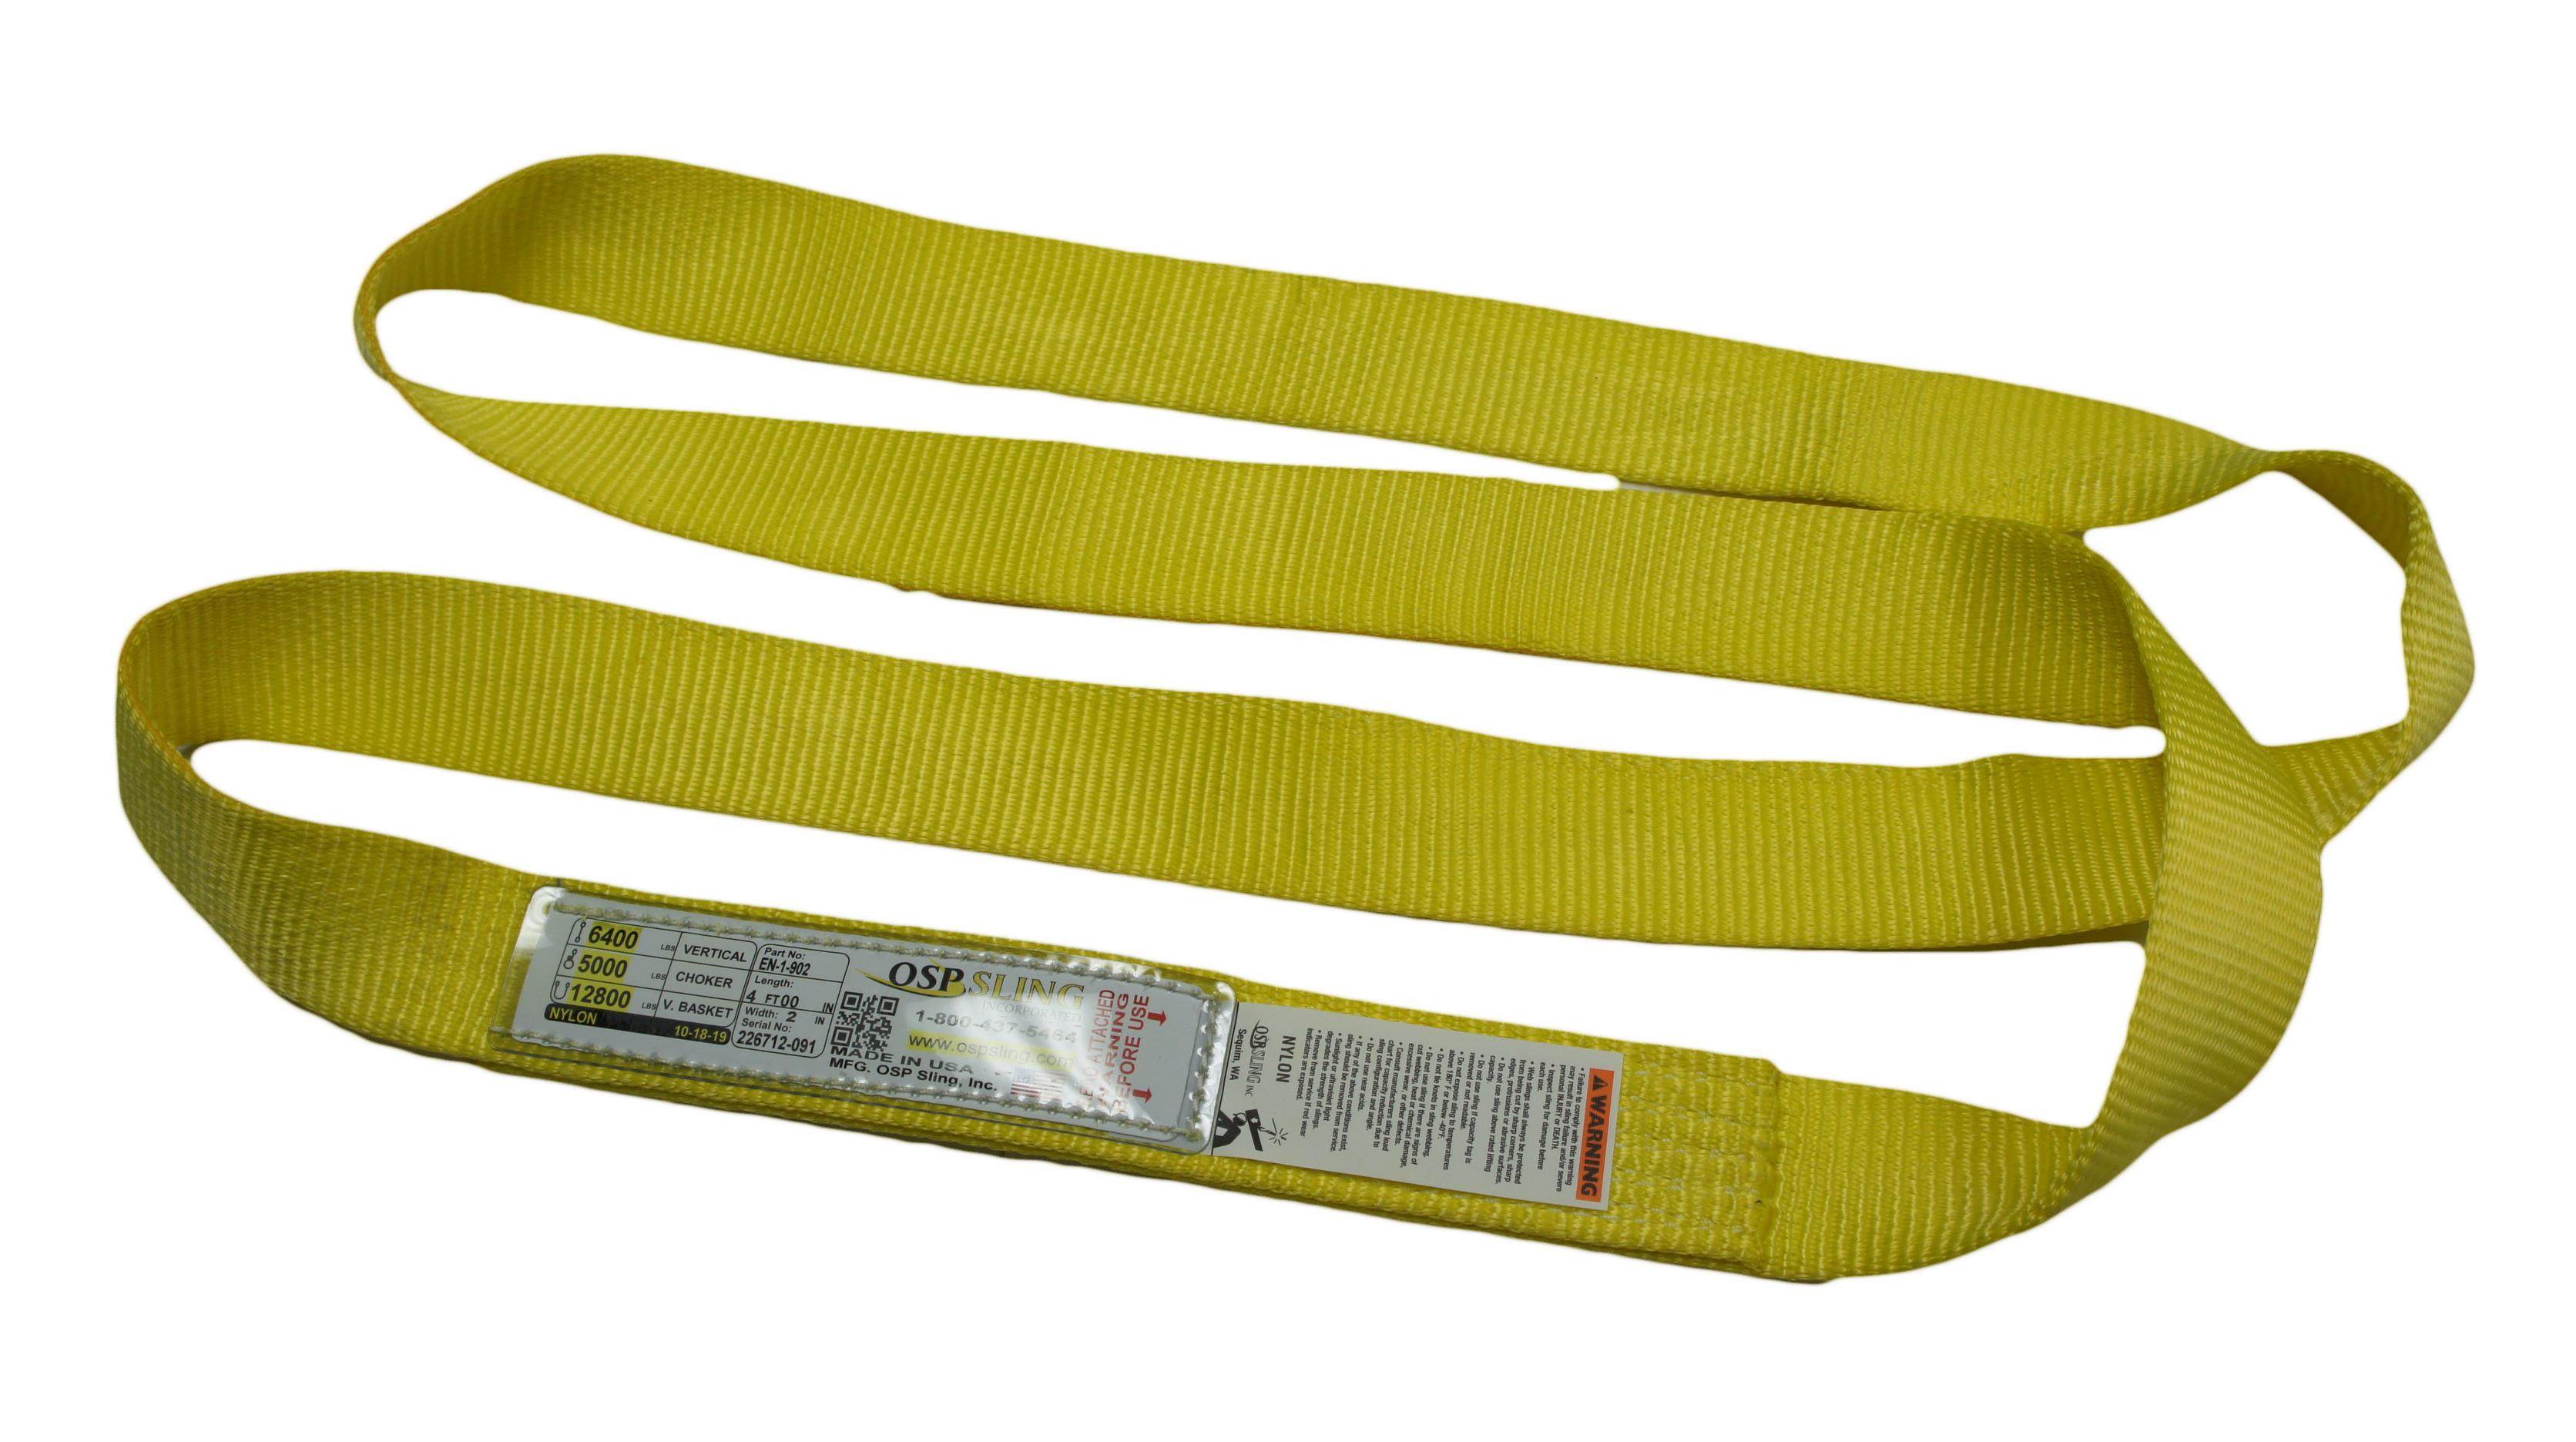 Nylon Lifting Slings - Endless Type Configuration